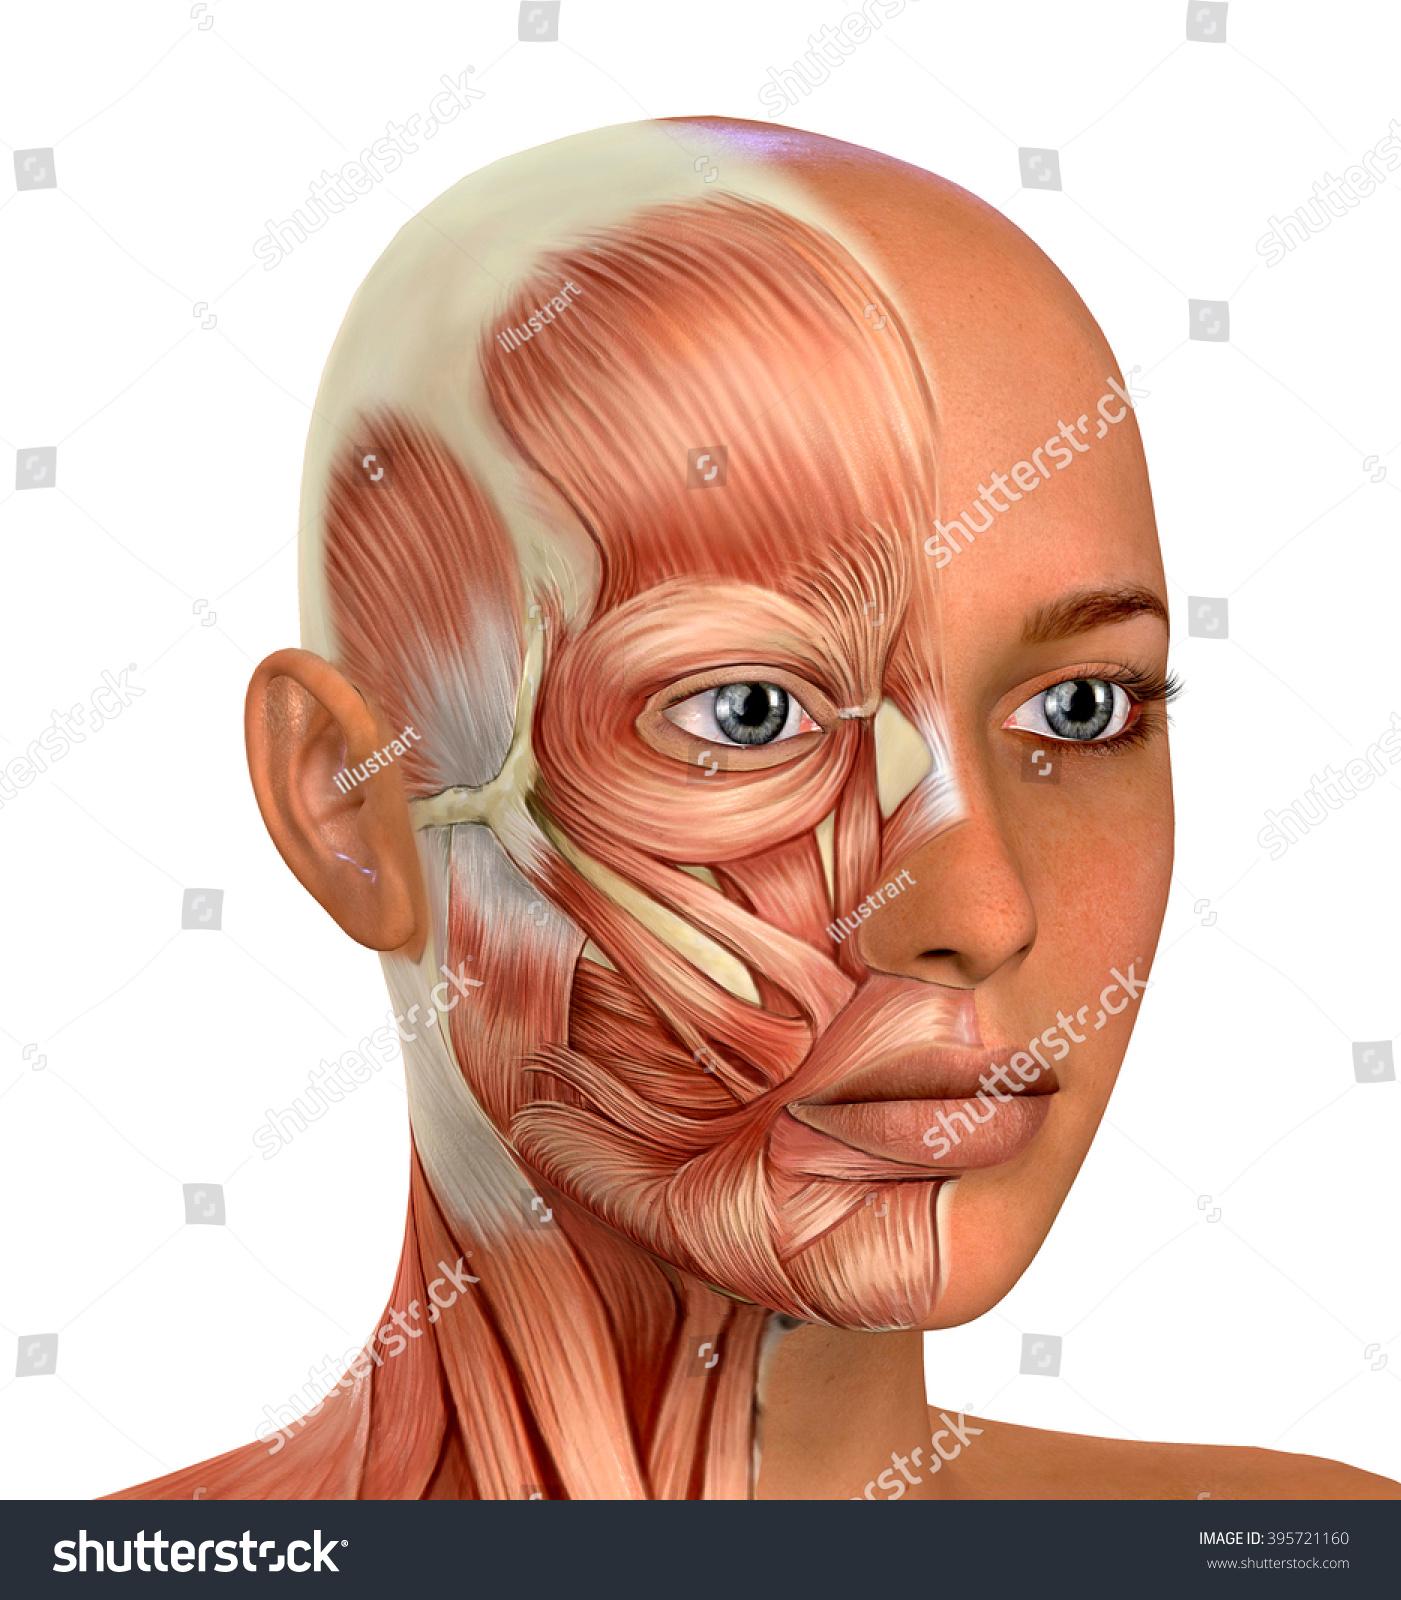 chin muscles diagram 1986 honda trx 350 wiring female face anatomy stock illustration 395721160